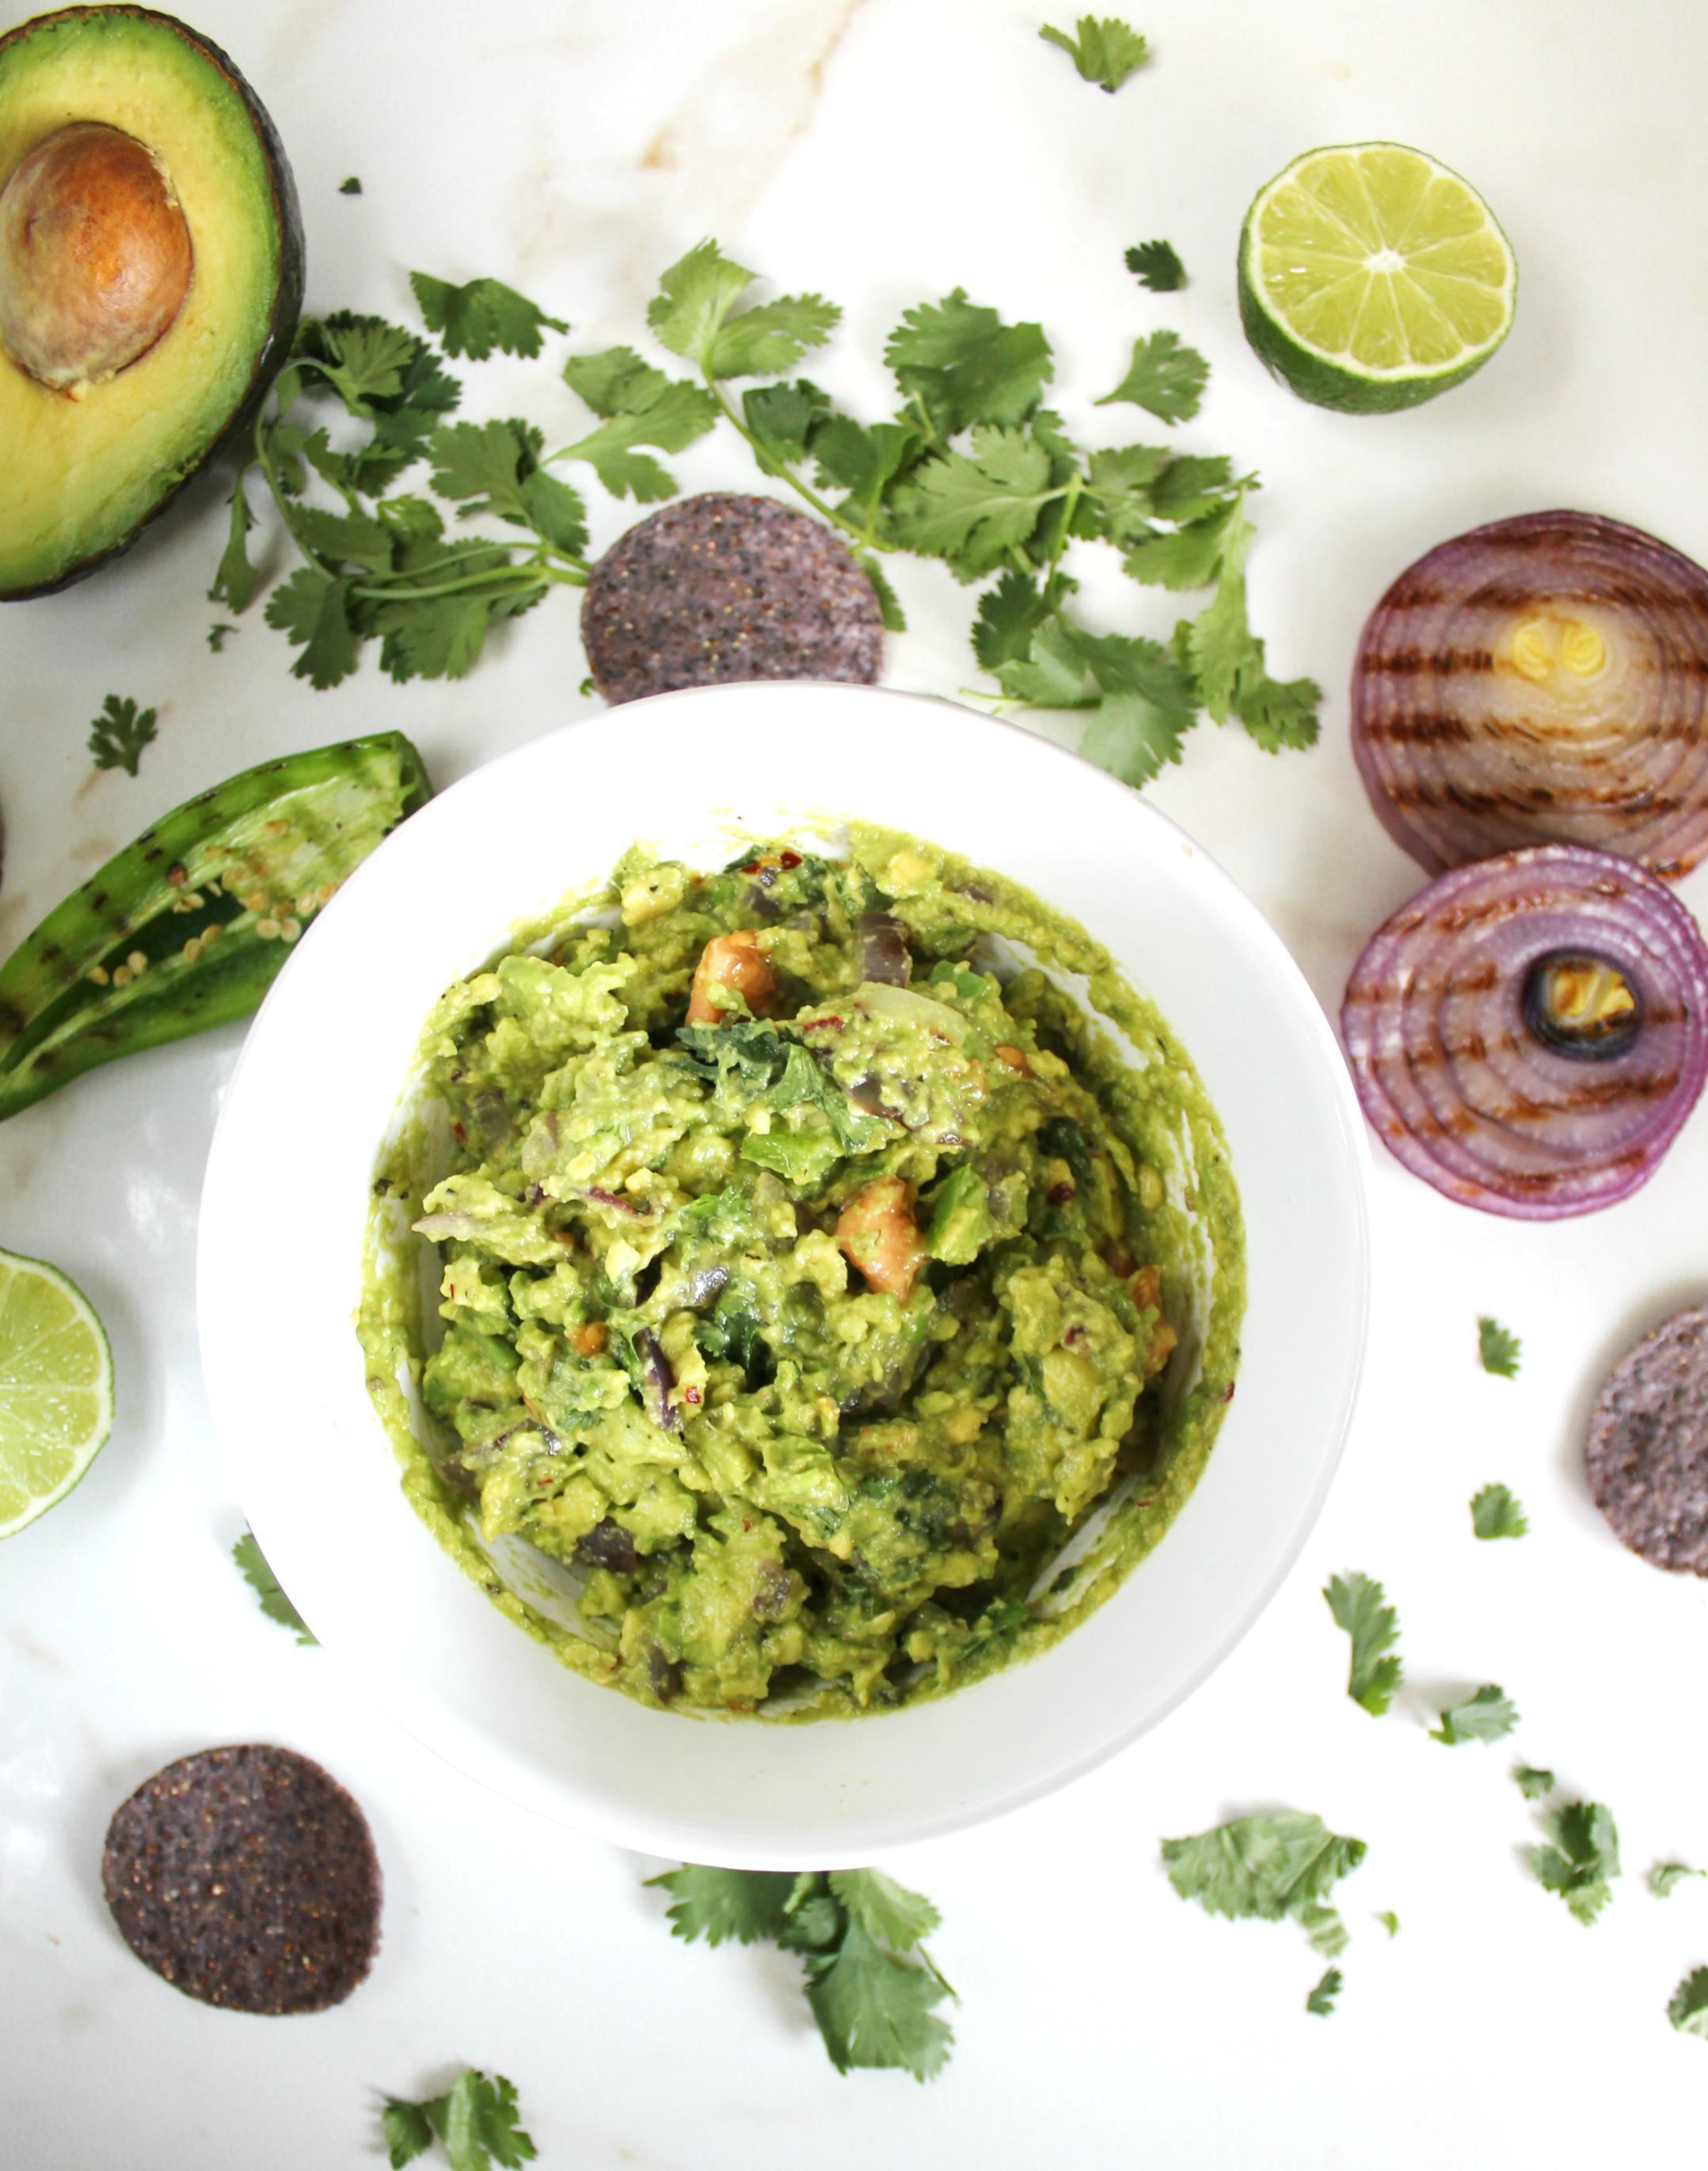 This Grilled Veggie Guacamole combines charred veggies with fresh avocado - perfect combo!   VEGAN + GF   ThisSavoryVegan.com